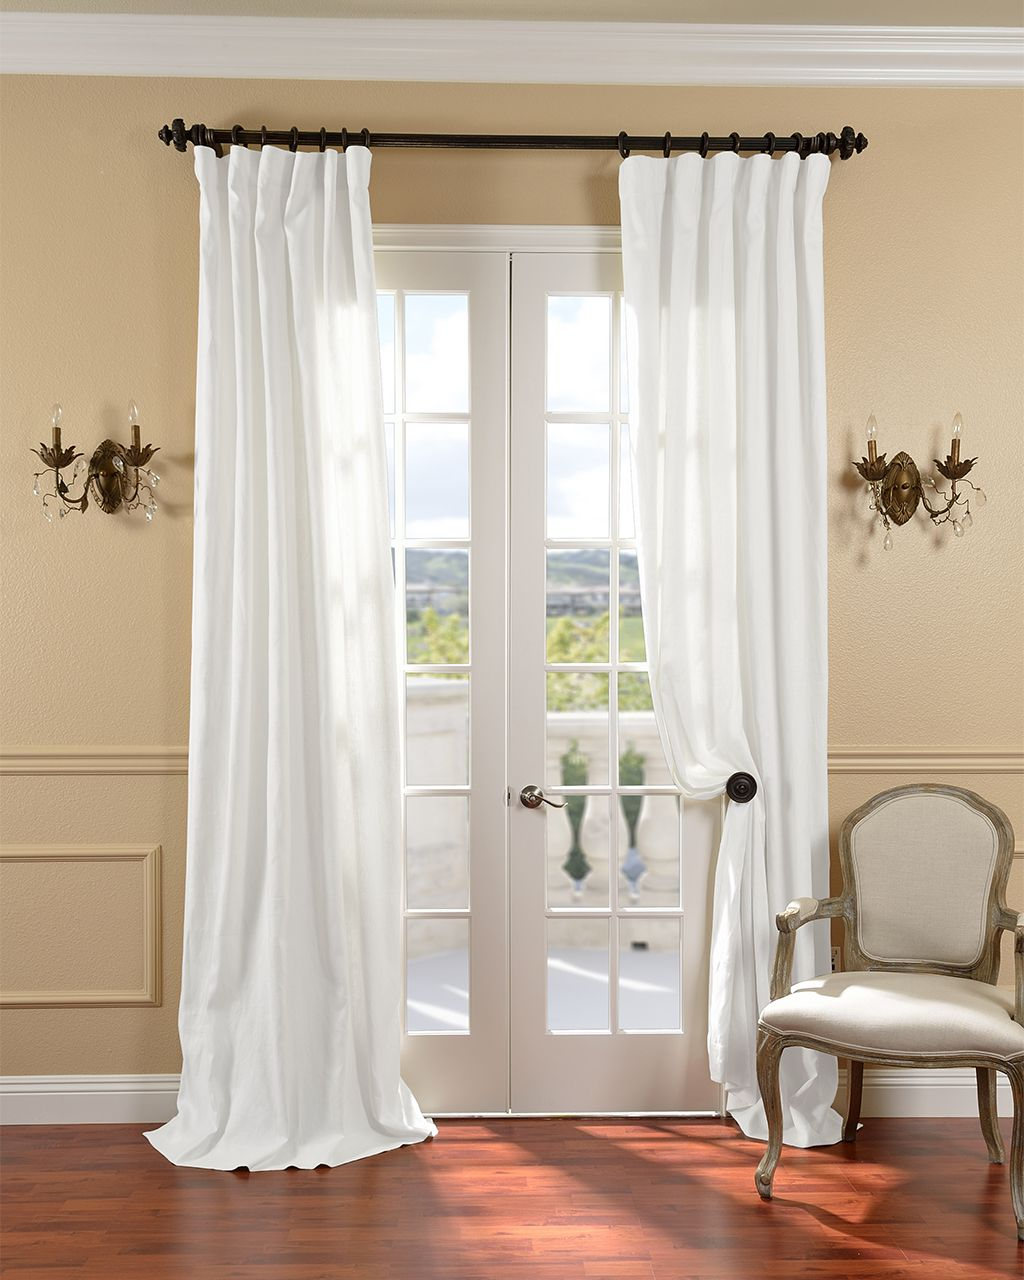 Linen window treatments - White Window Treatments